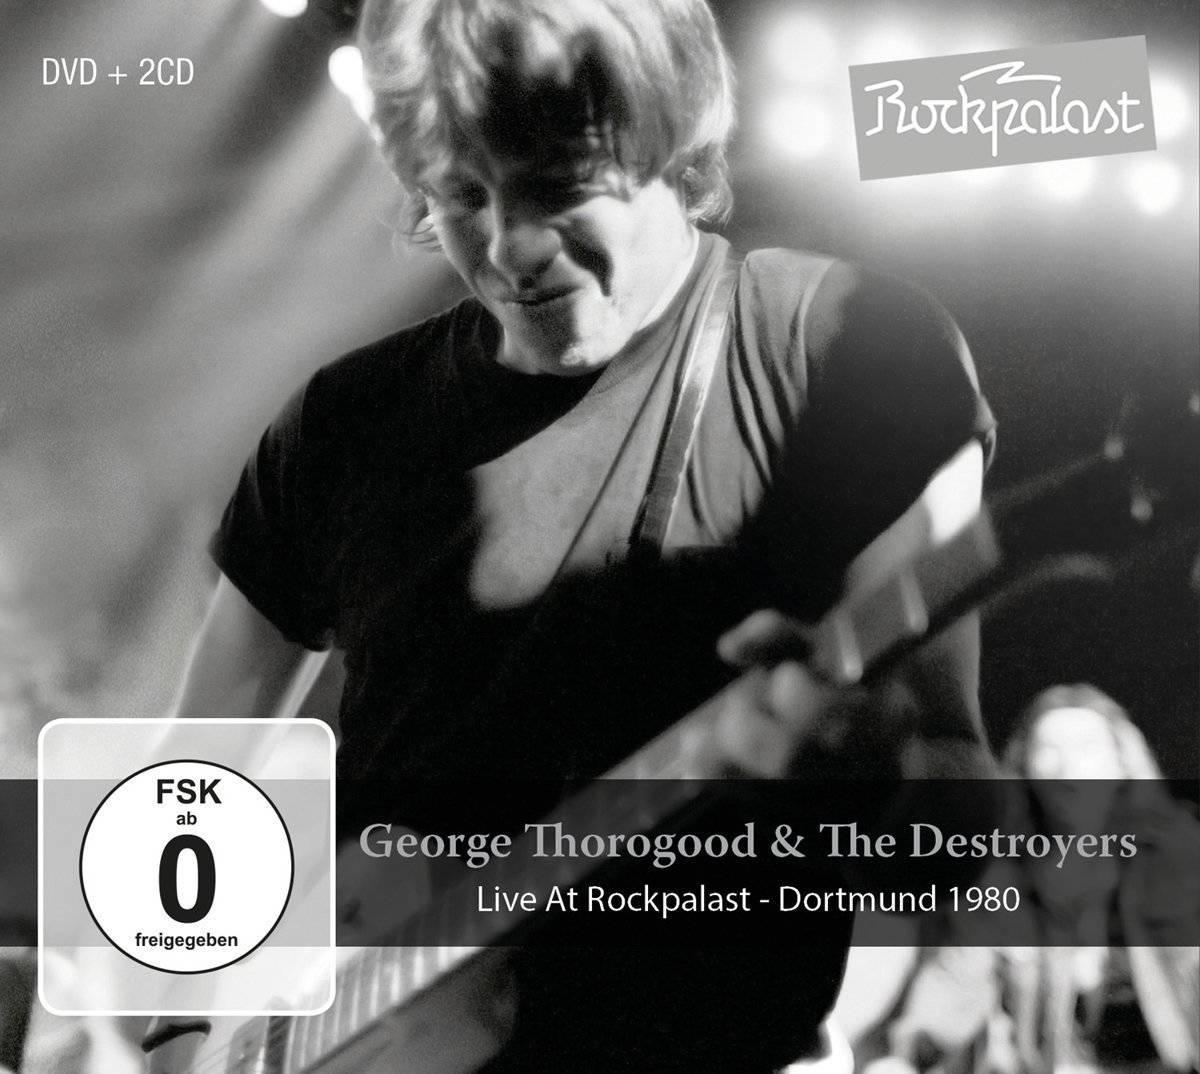 George Thorogood & The Destroyers - Live At Rockpalast: Dortmund 1980